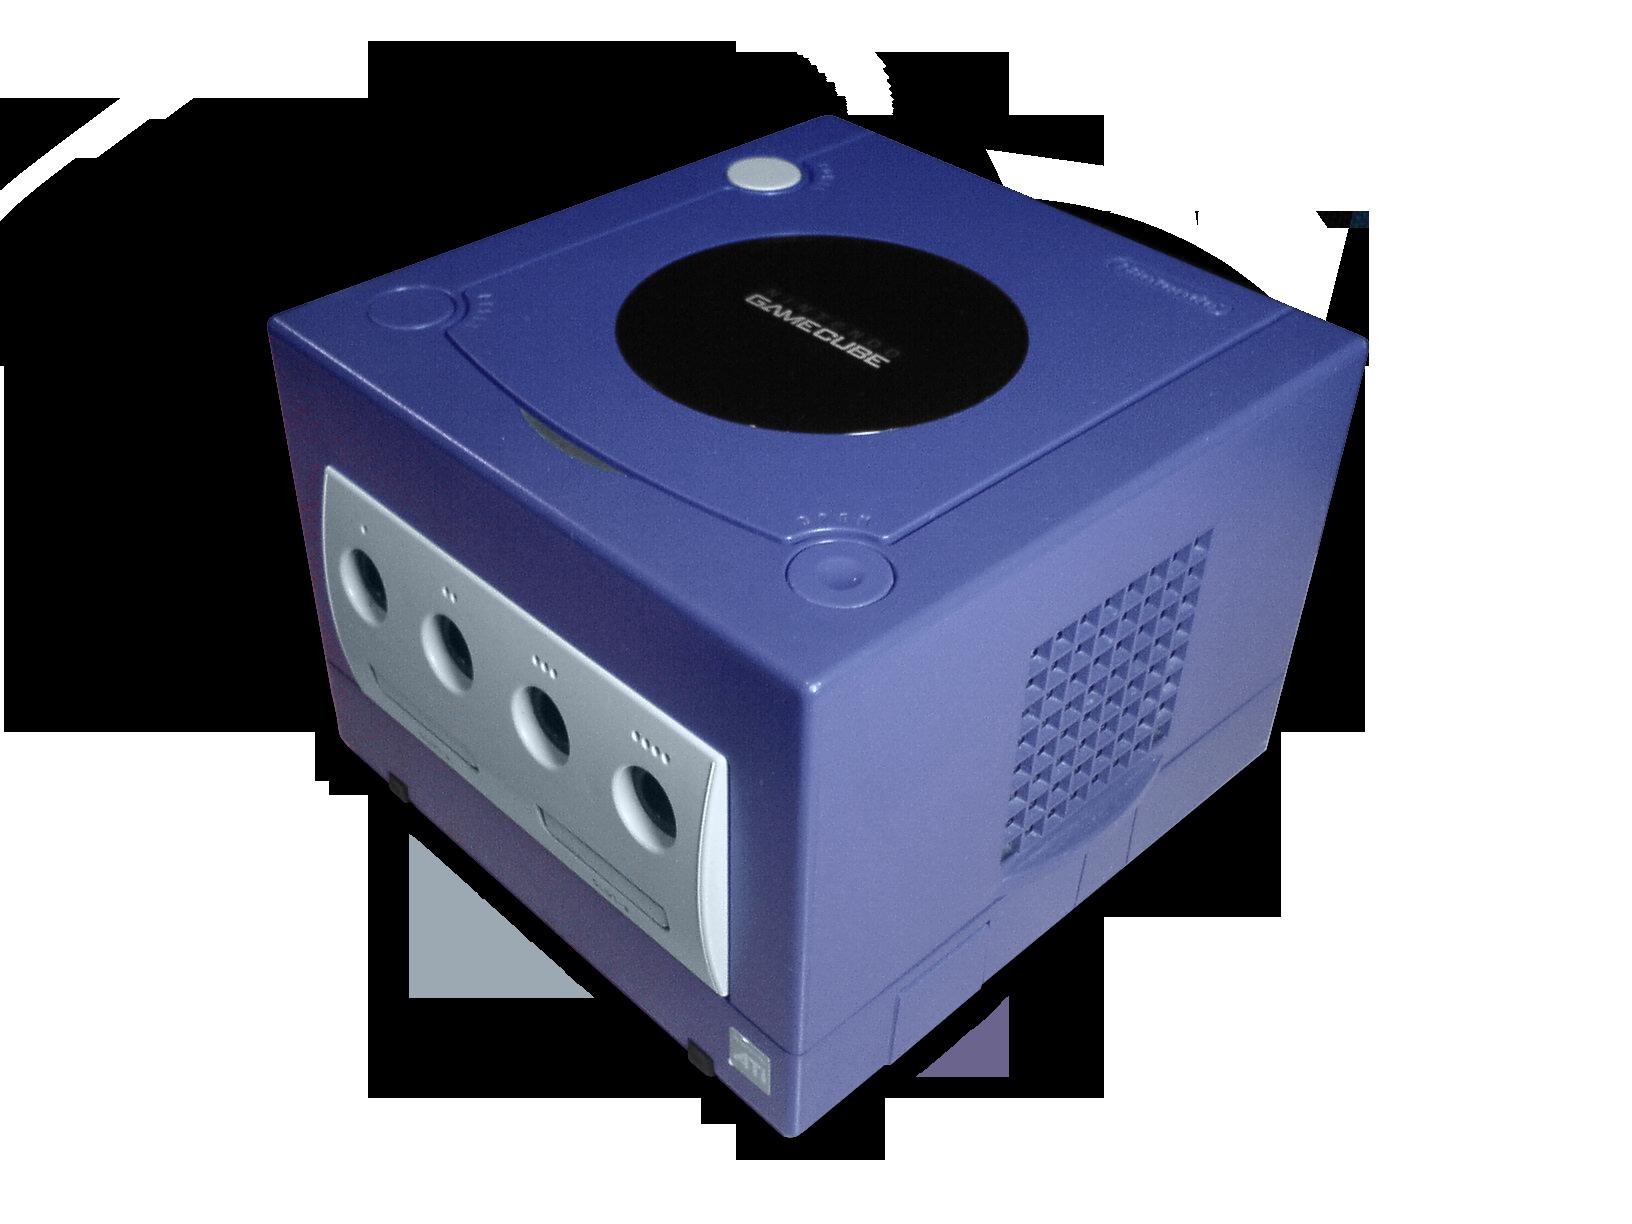 File:Lone GameCube.png.